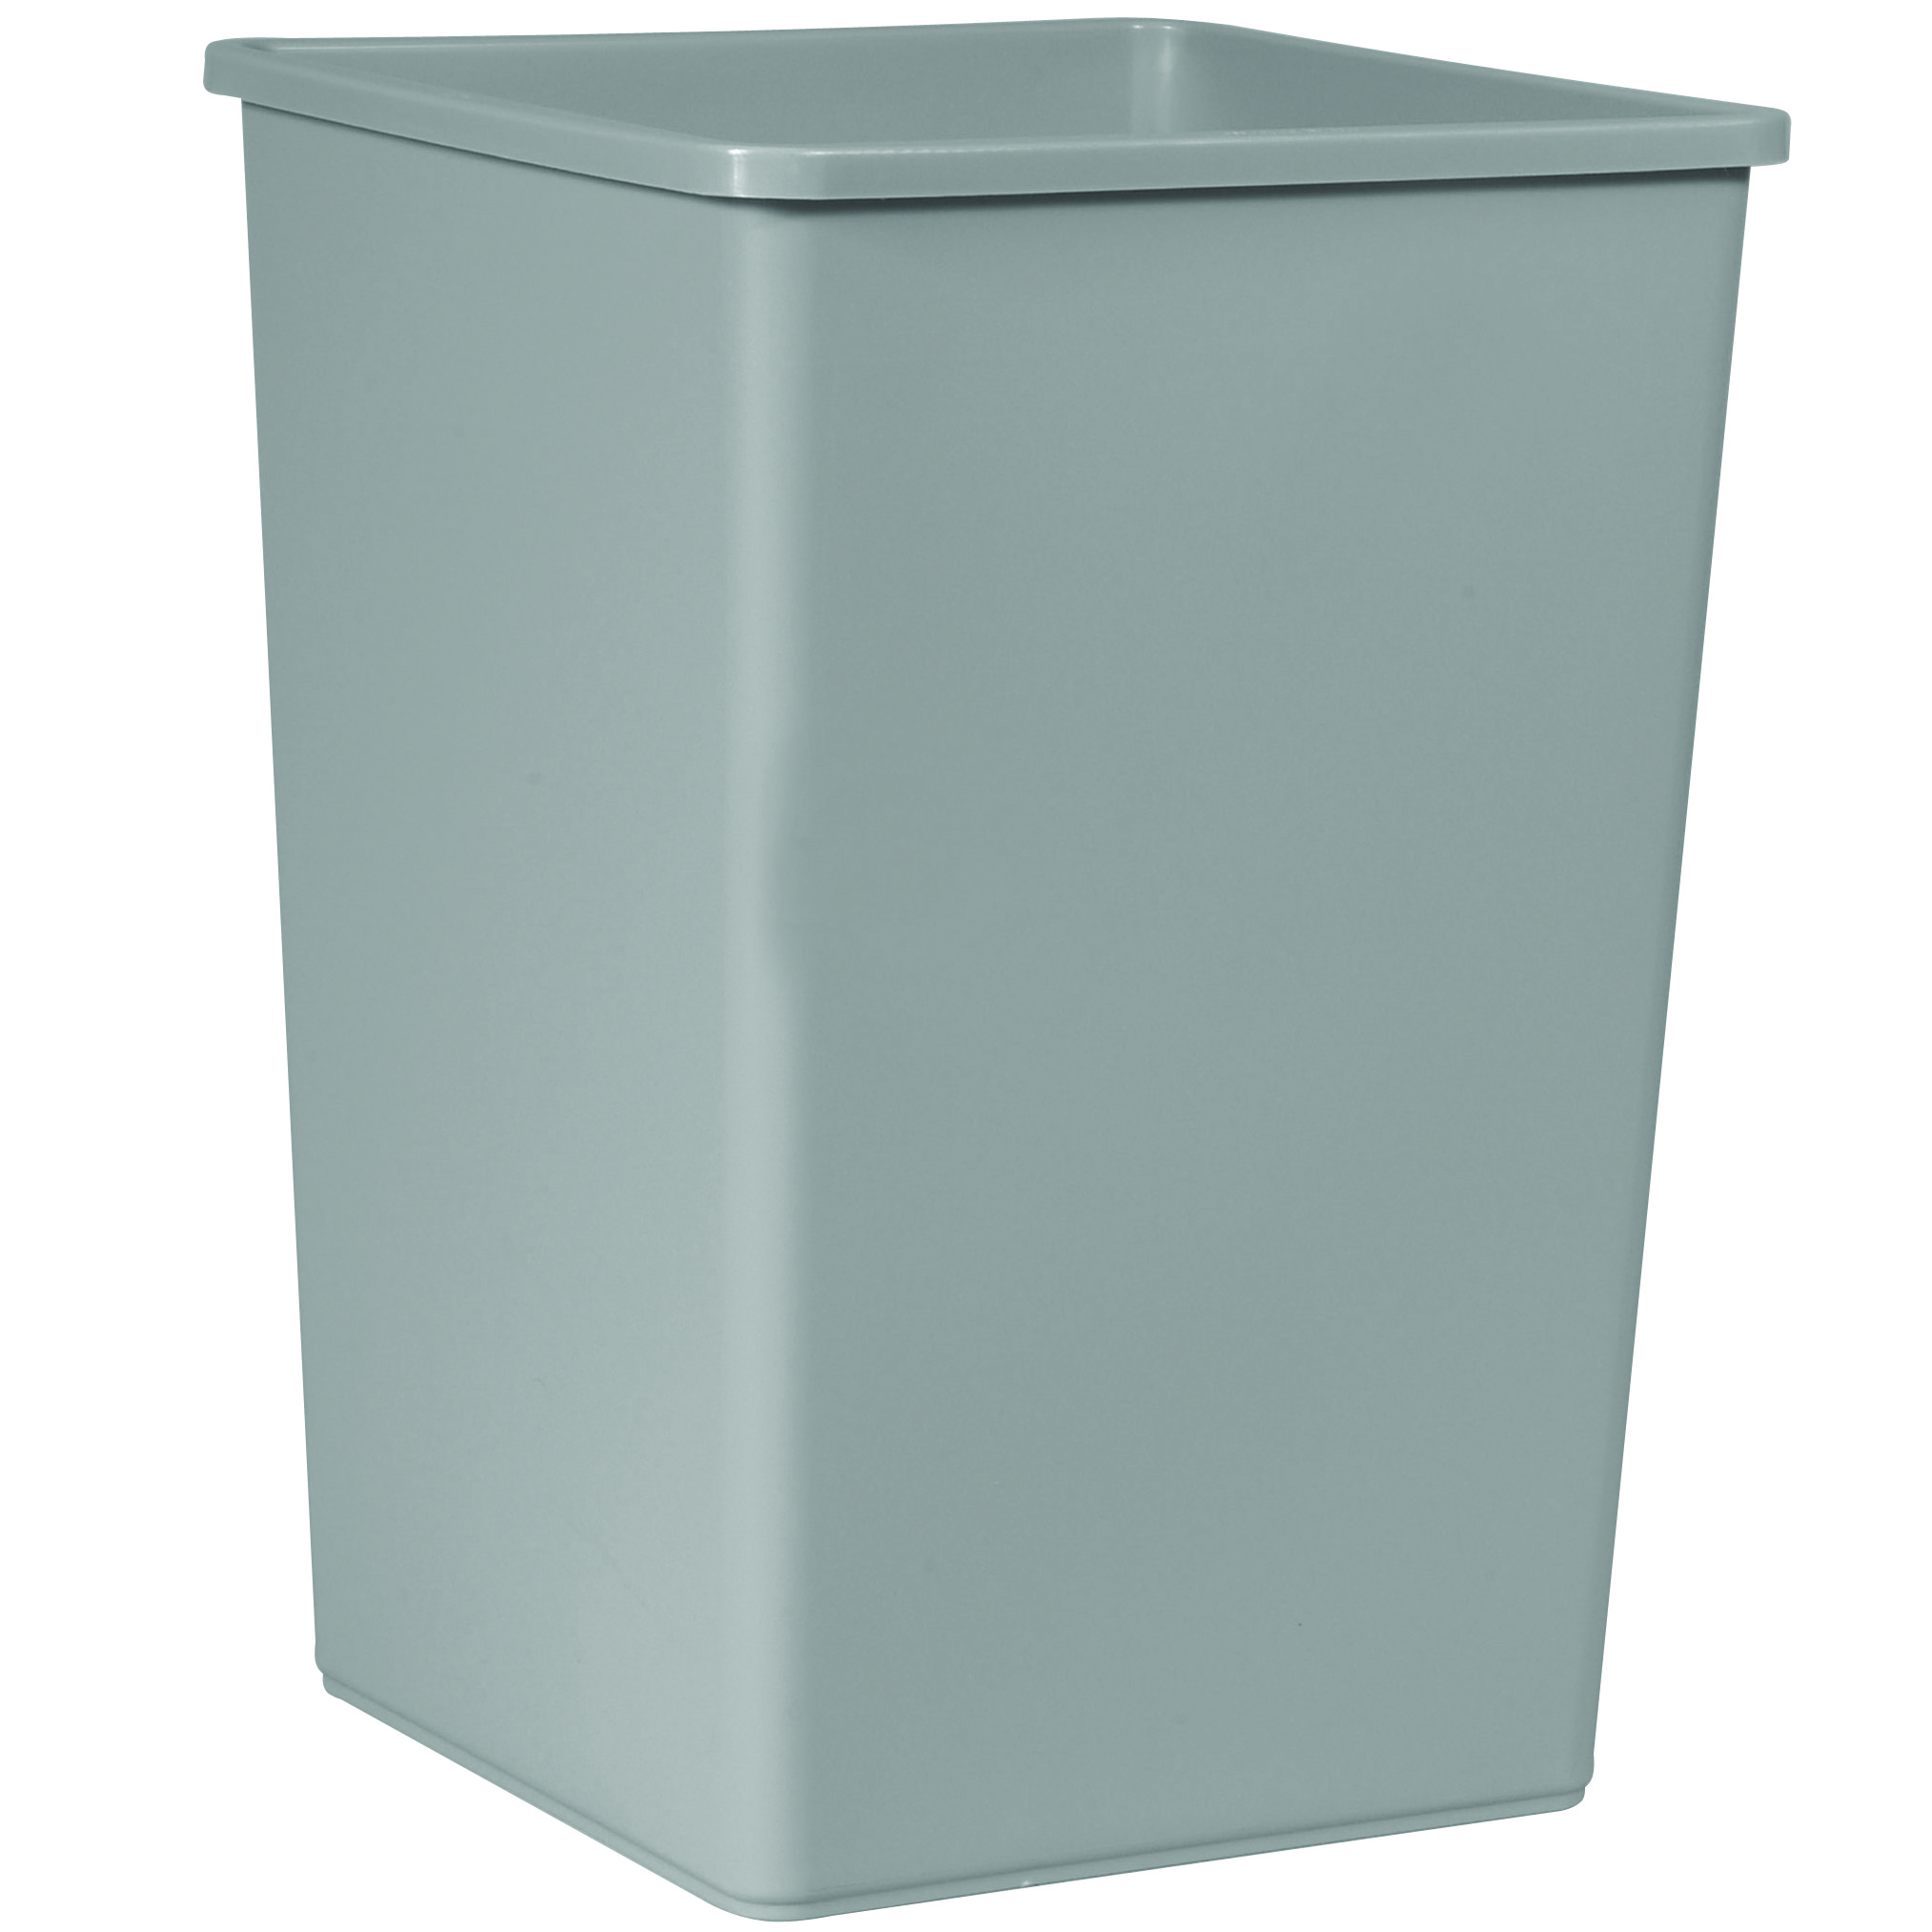 35 Gallon Untouchable Square Trash Container Trashcans